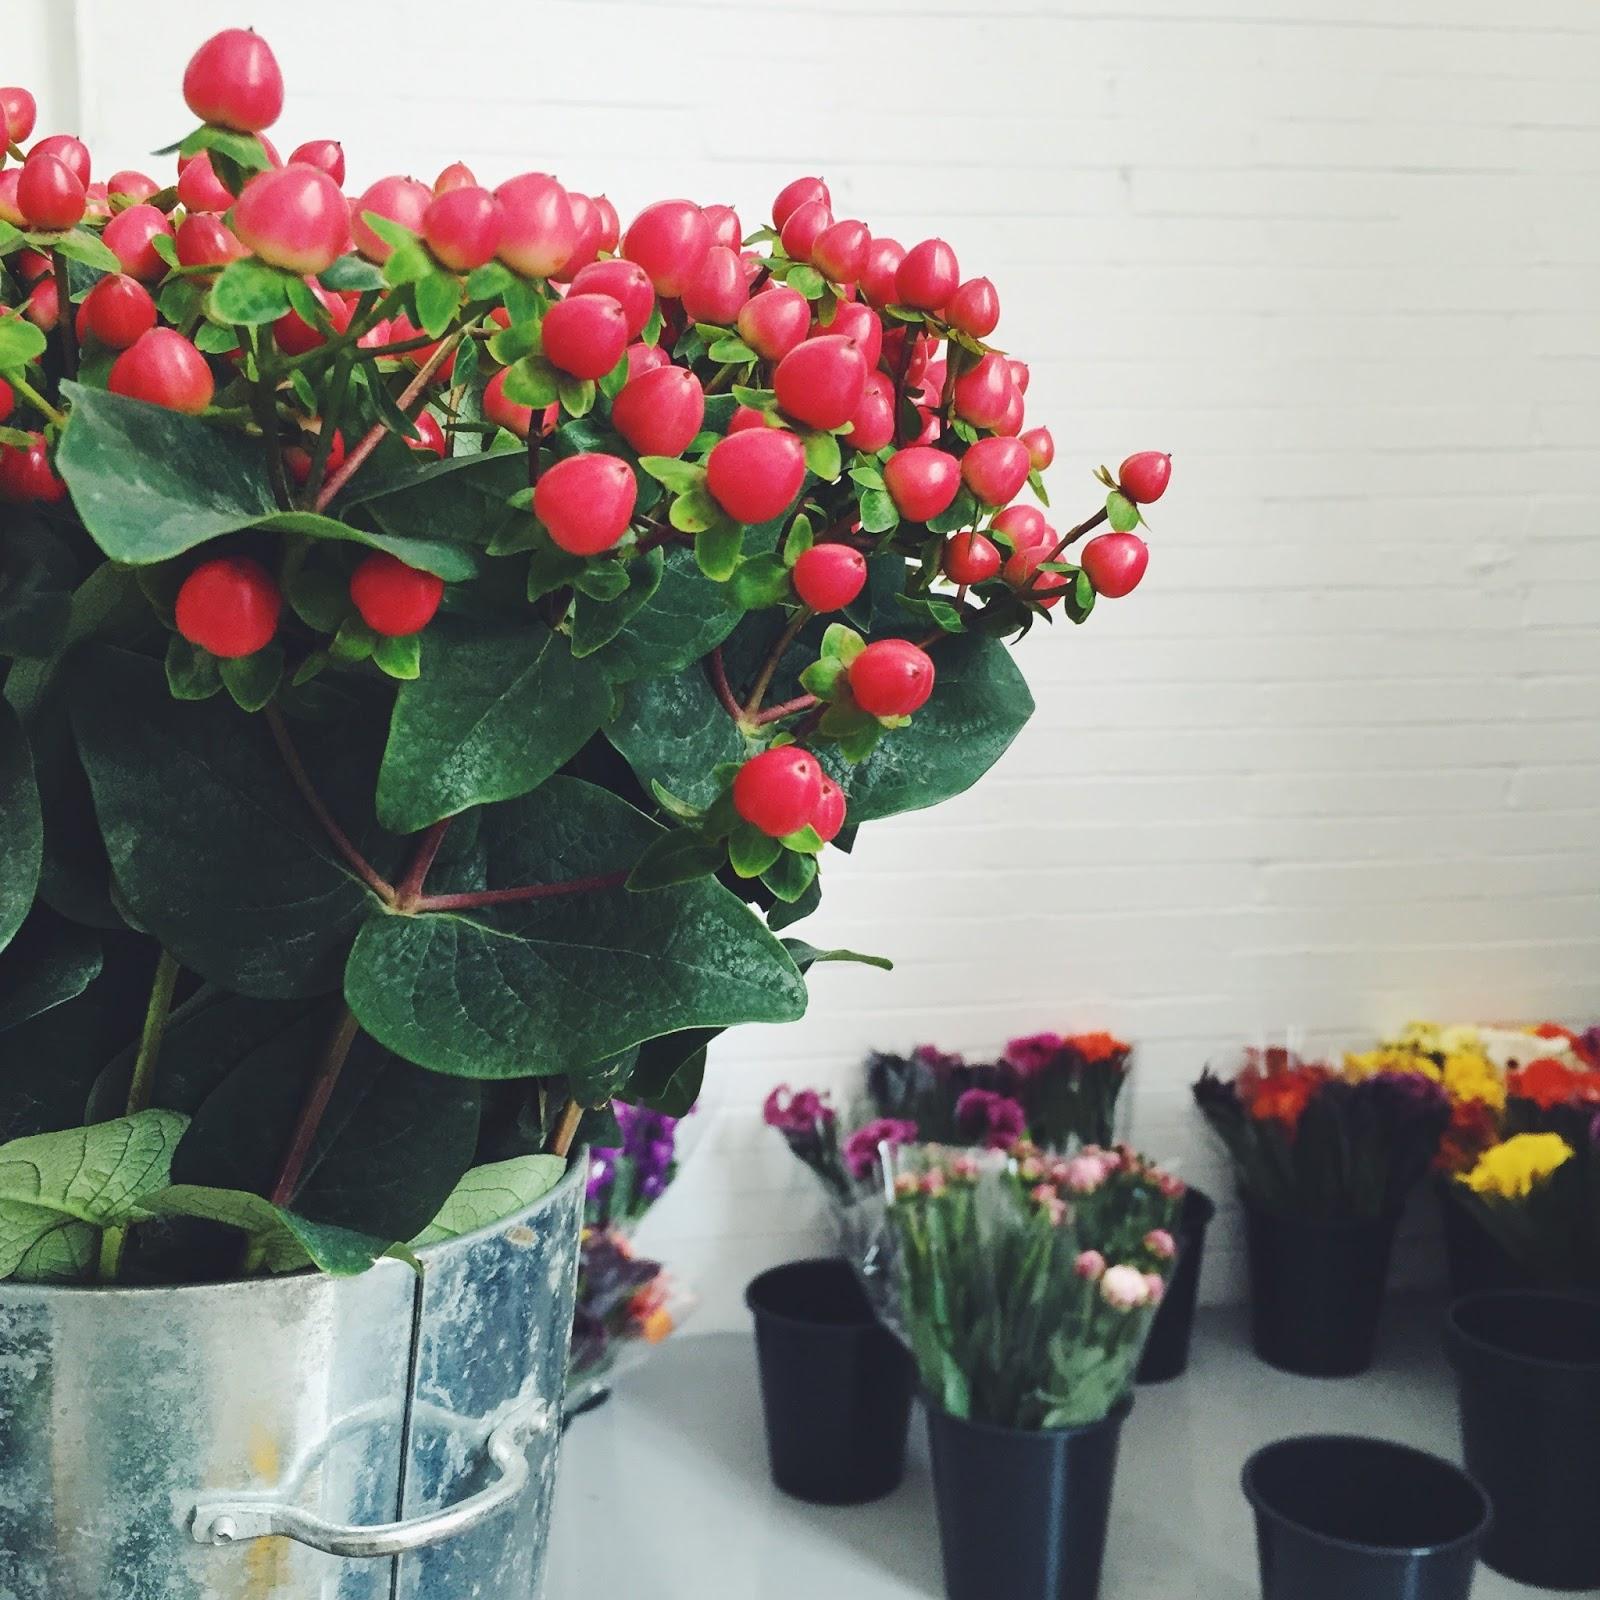 debenhams aw15 press day flowers